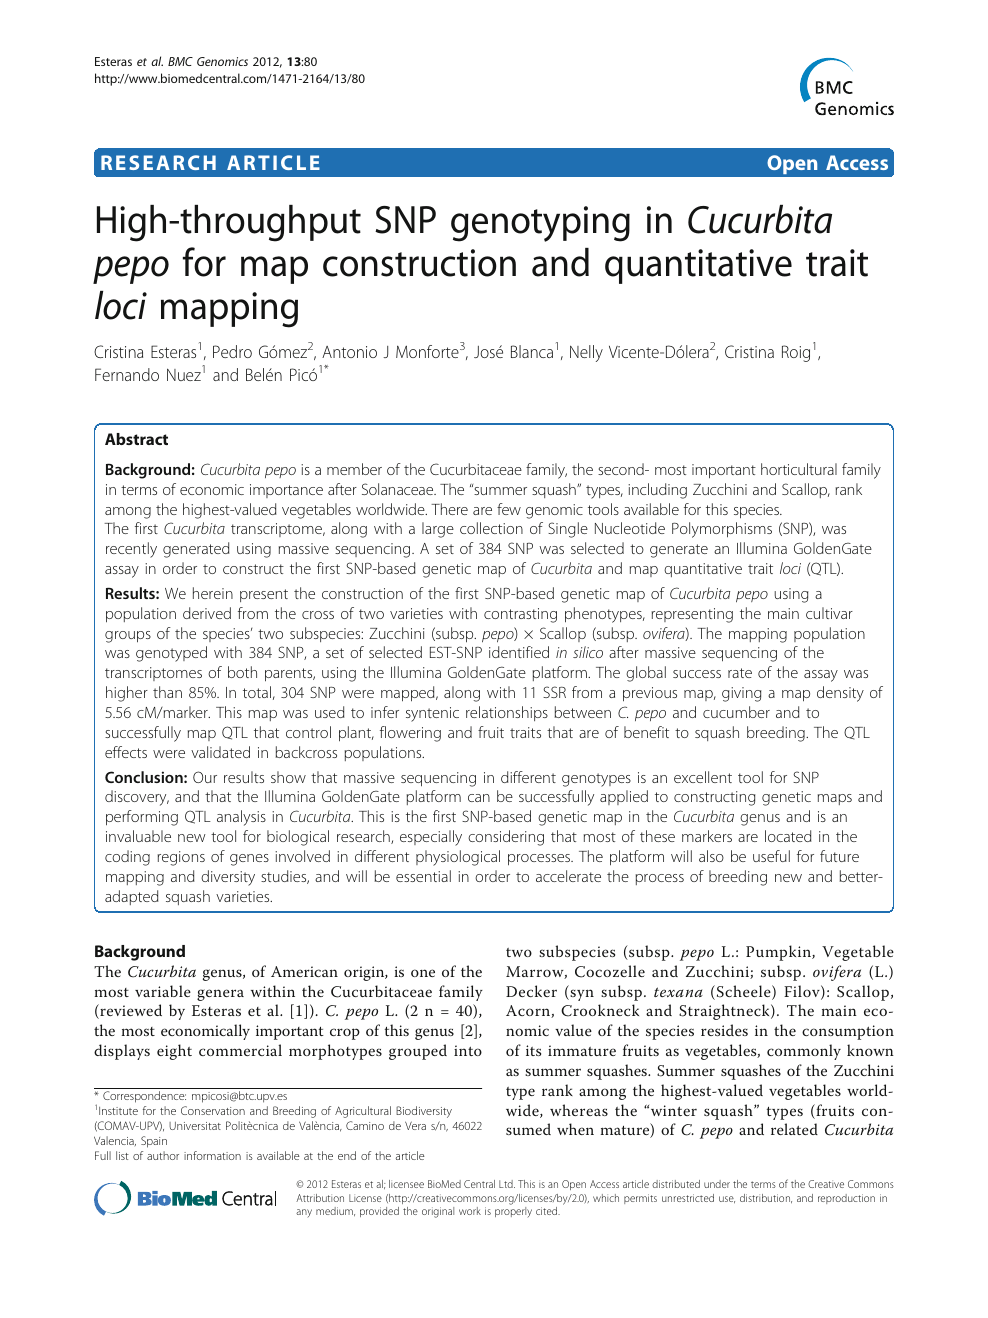 High-throughput SNP genotyping in Cucurbita pepo for map ... on